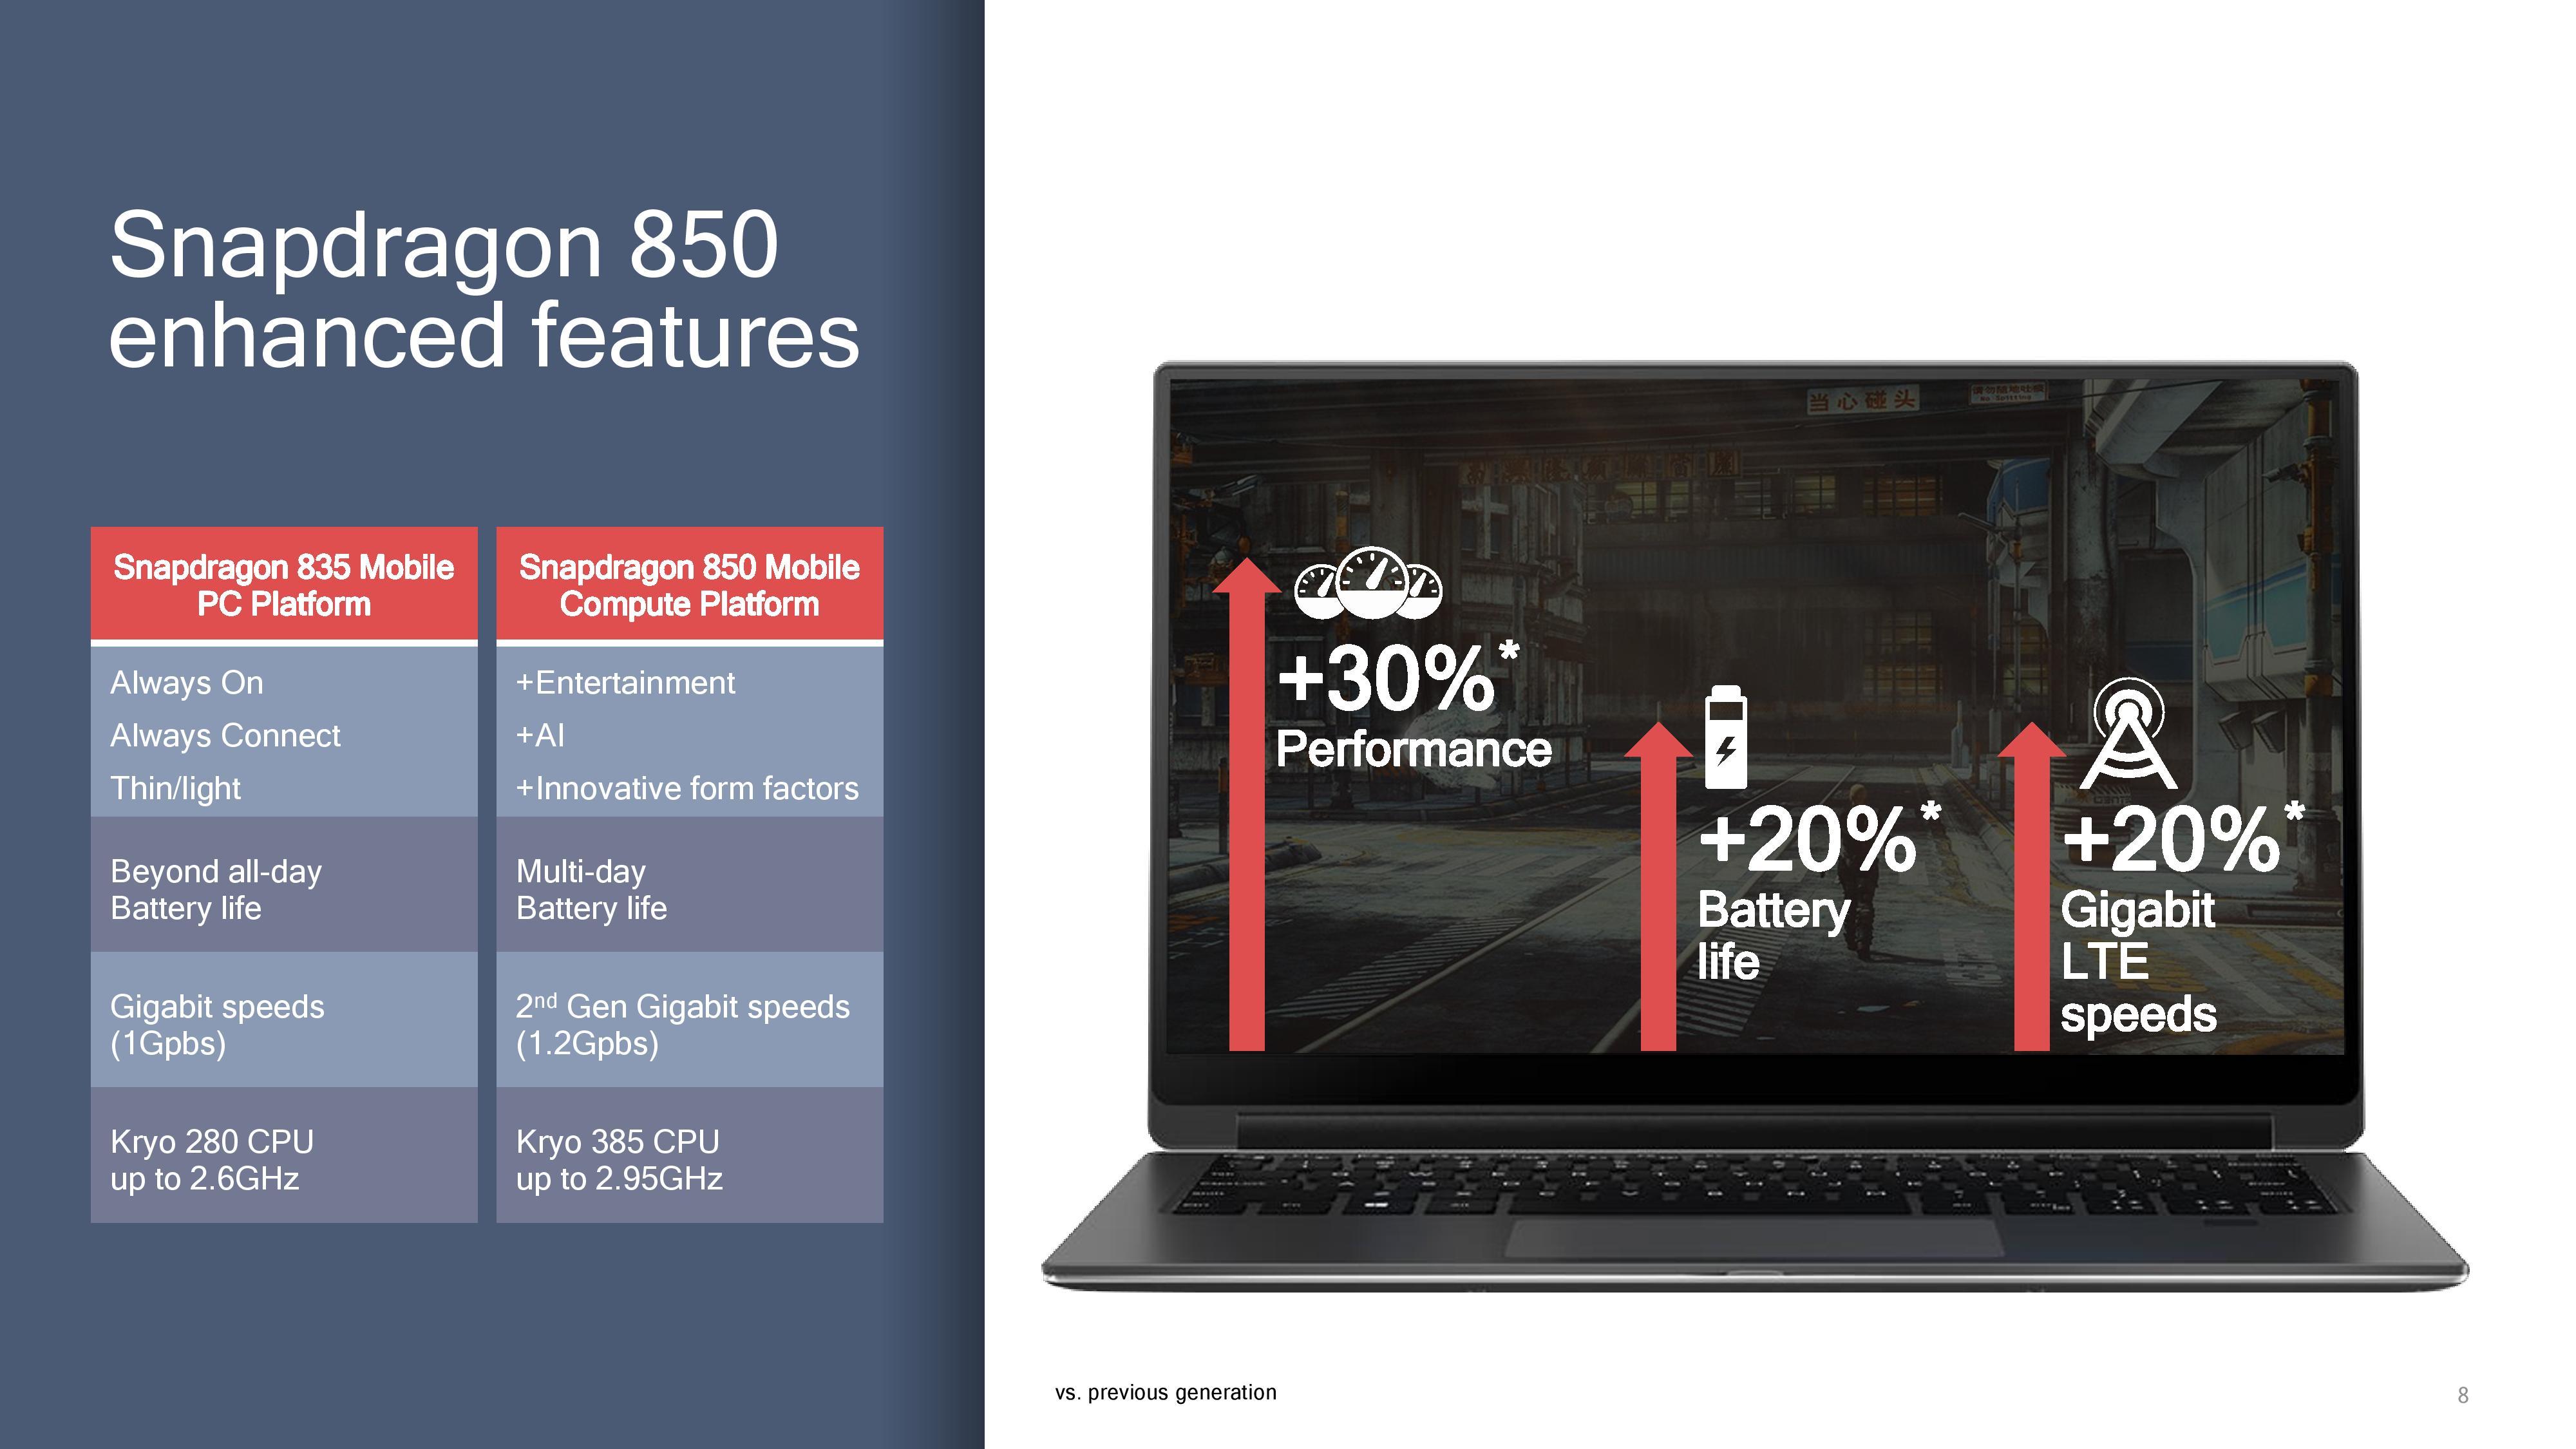 Qualcomm announces Snapdragon 850 Mobile processor for Always Connected Windows 10 PCs 3